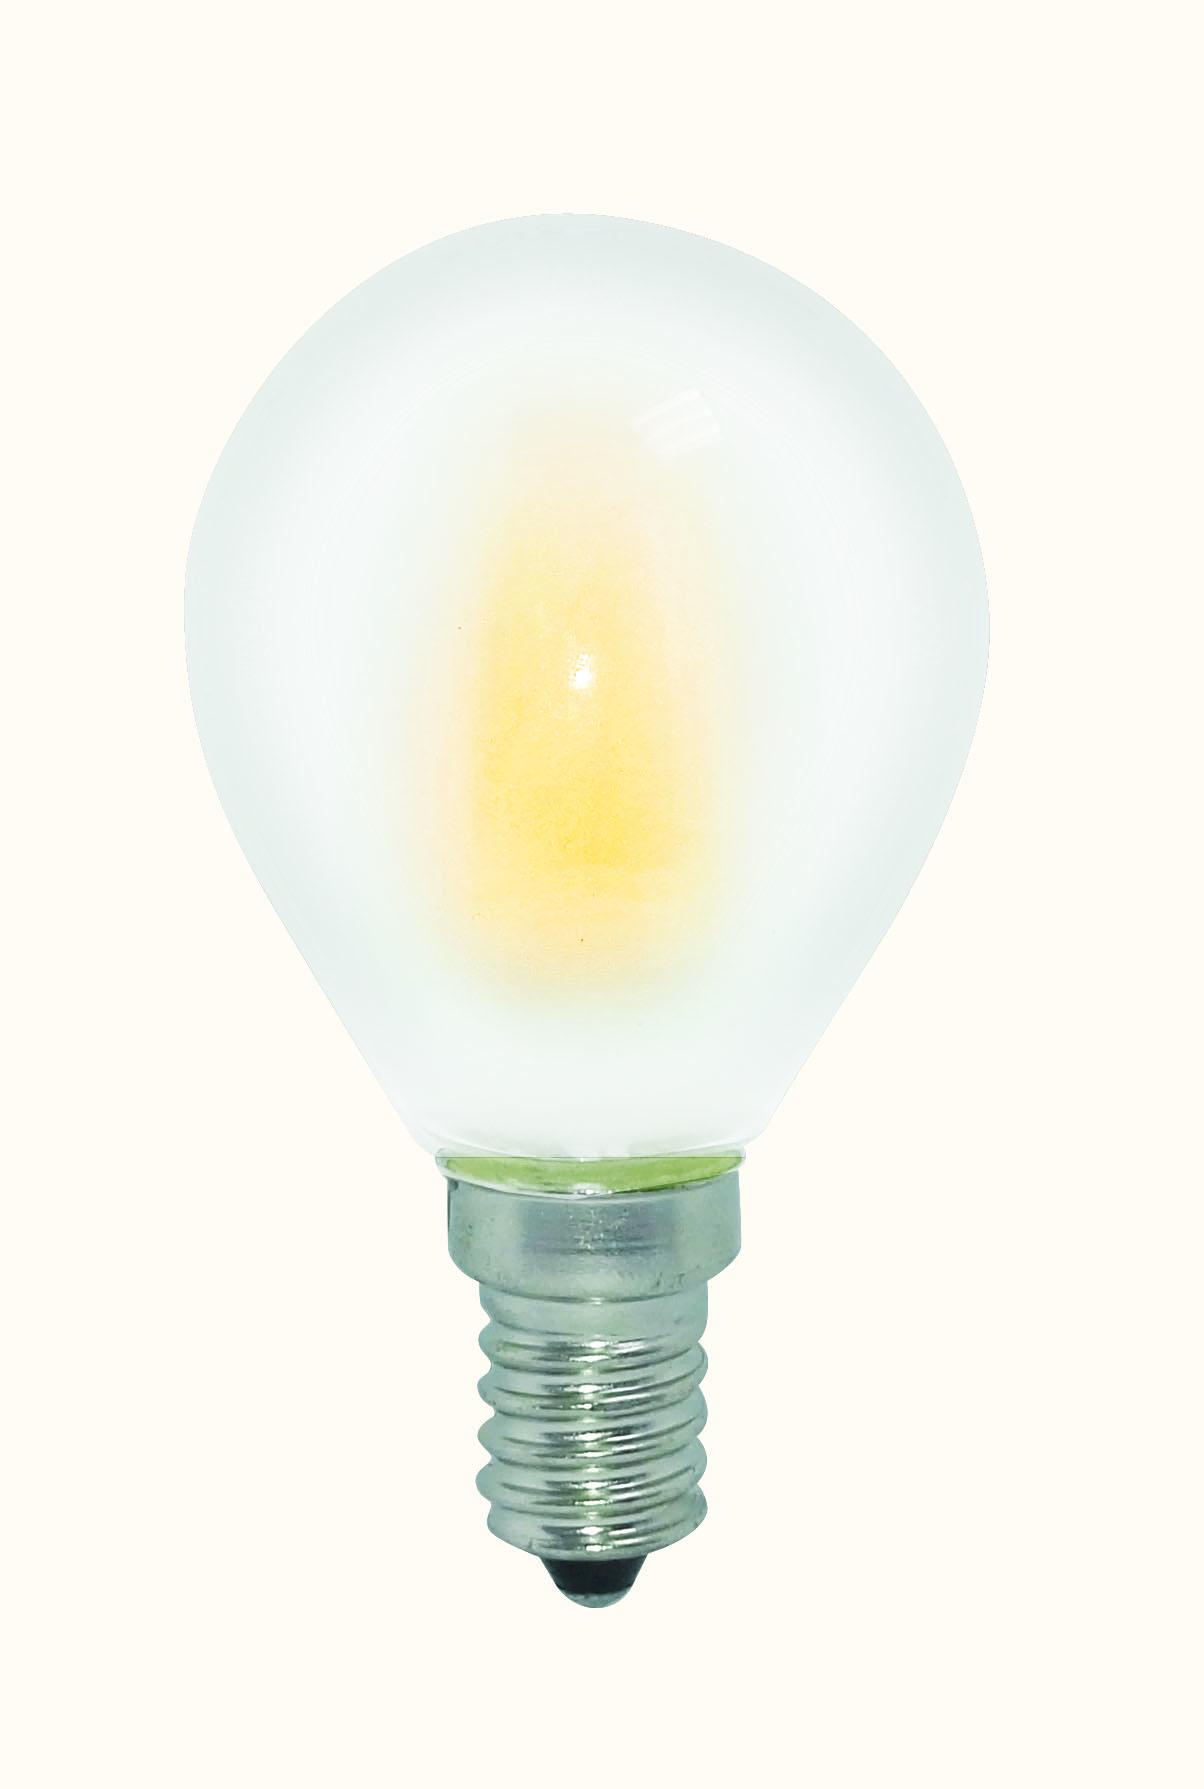 Светодиодная лампа Виктел BK-14W5G45 Frosted Шар